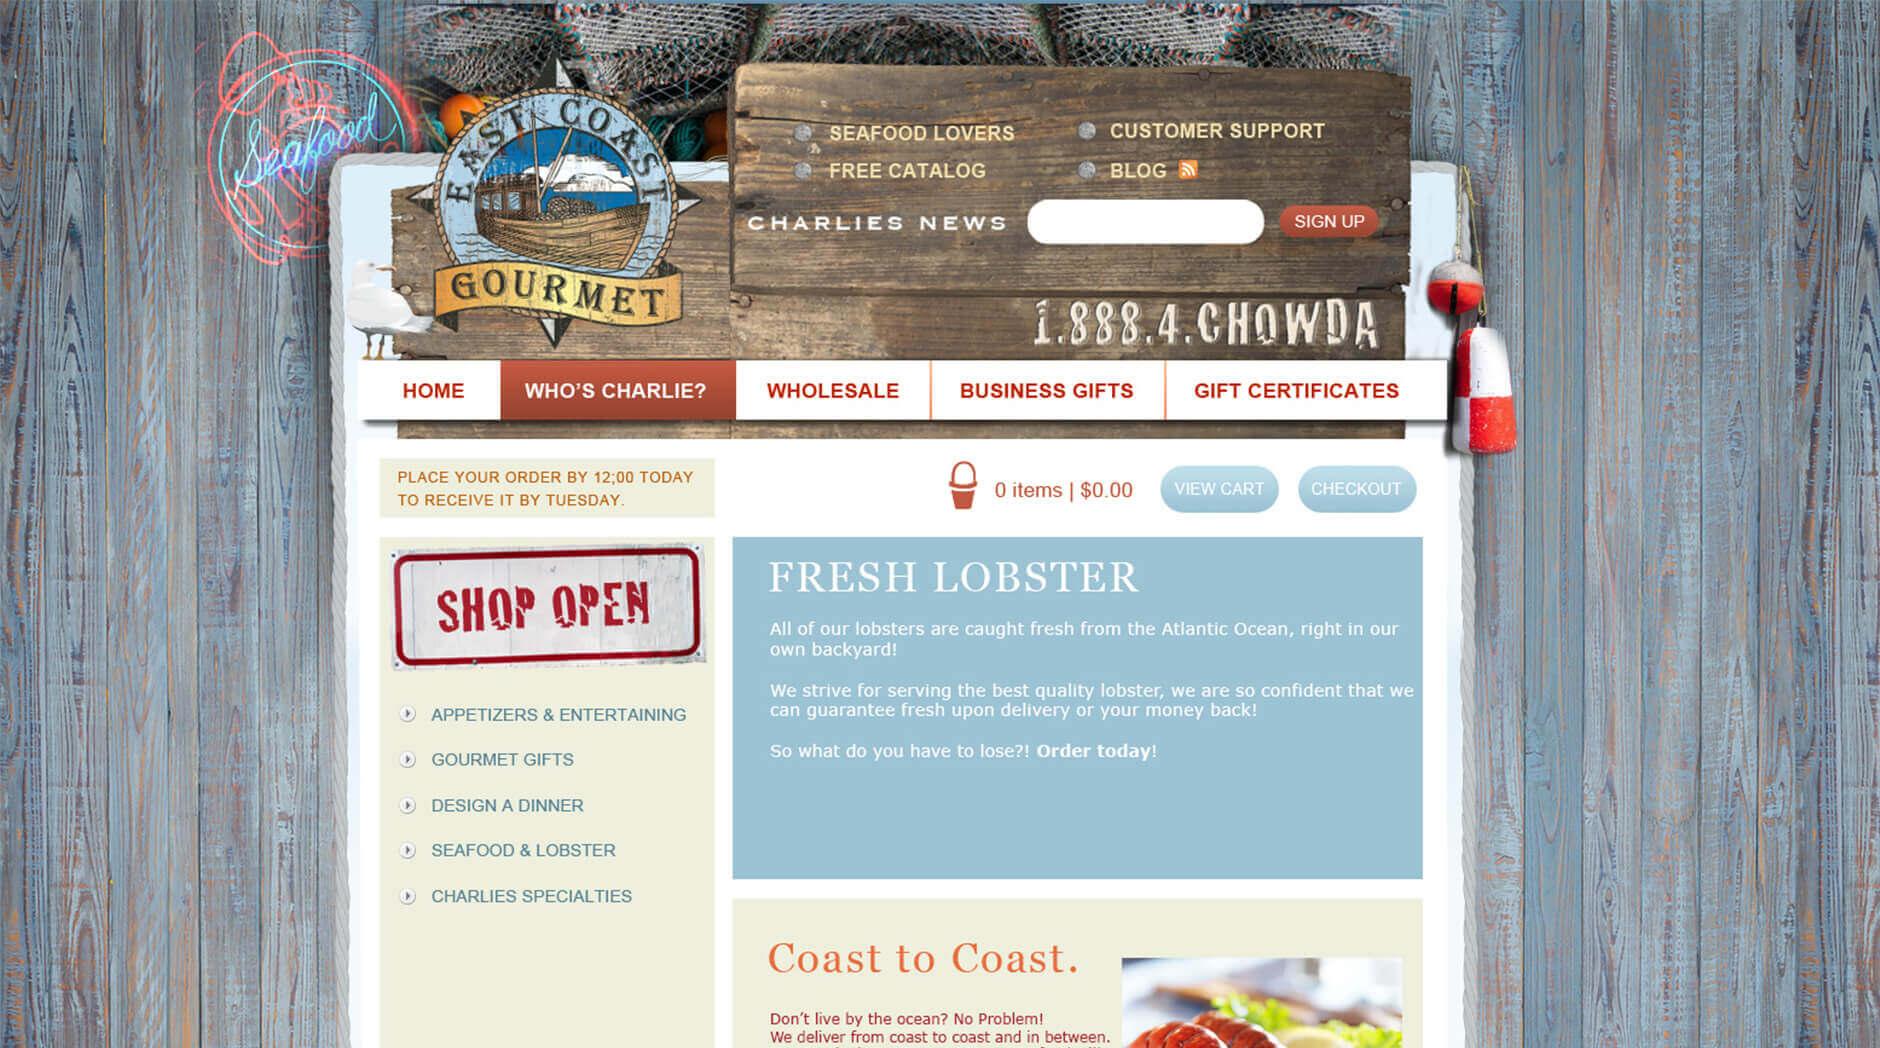 Gourmet Website Design 1 Gourmet Website Design